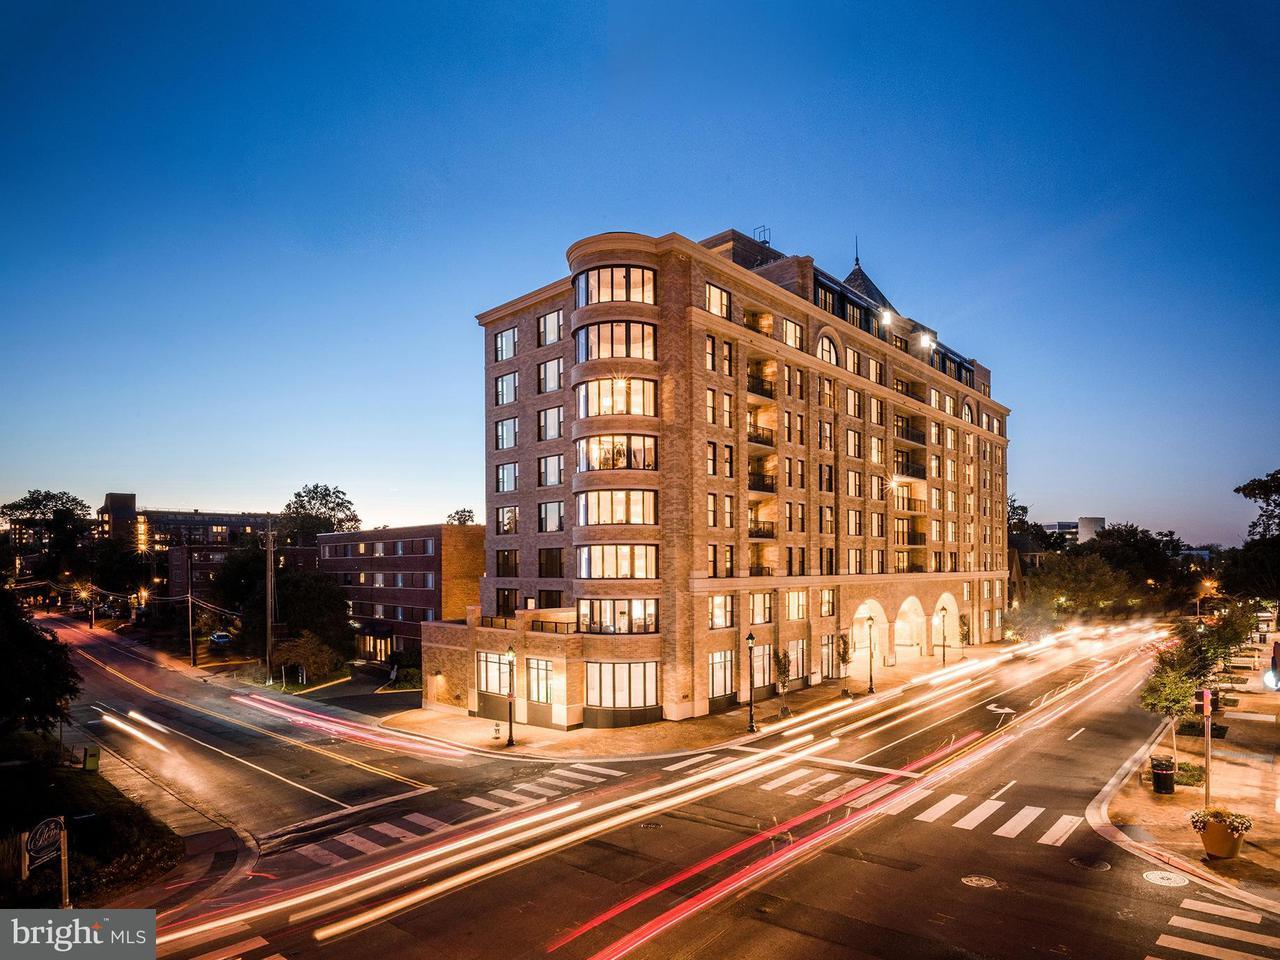 Condominium for Sale at 8302 WOODMONT AVE #900 8302 WOODMONT AVE #900 Bethesda, Maryland 20814 United States